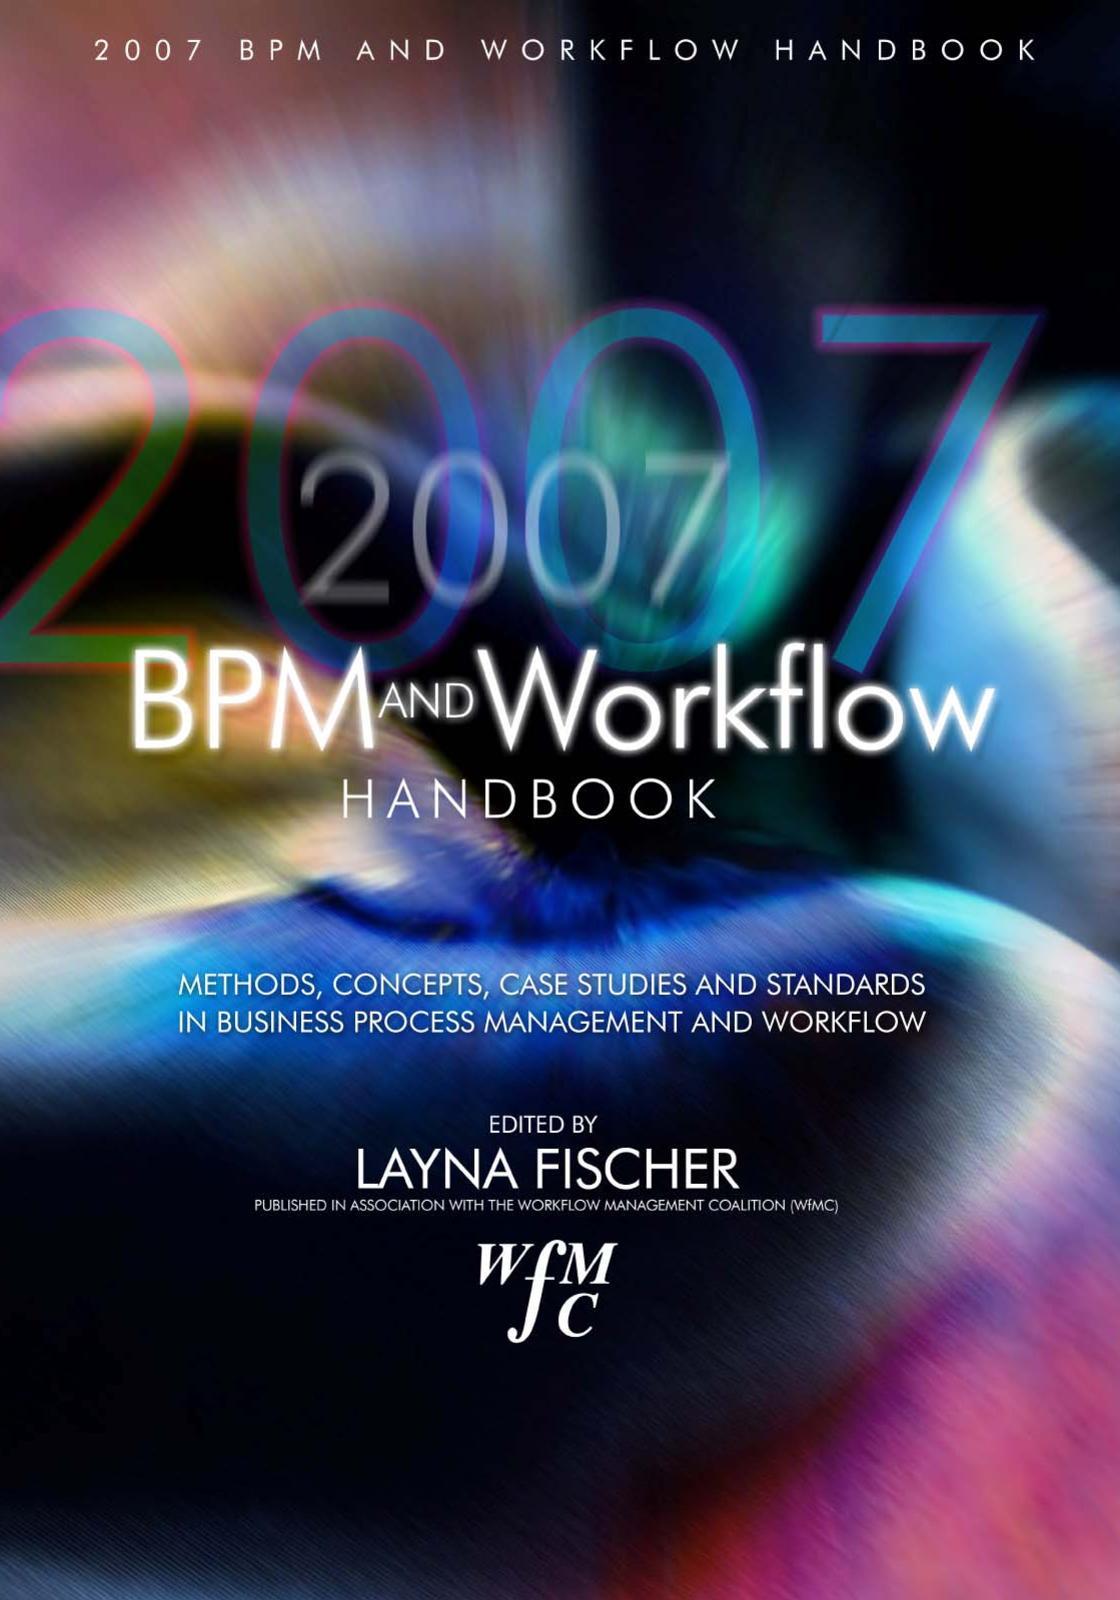 Calaméo - Documento Integral Bpm Workflow Handbook